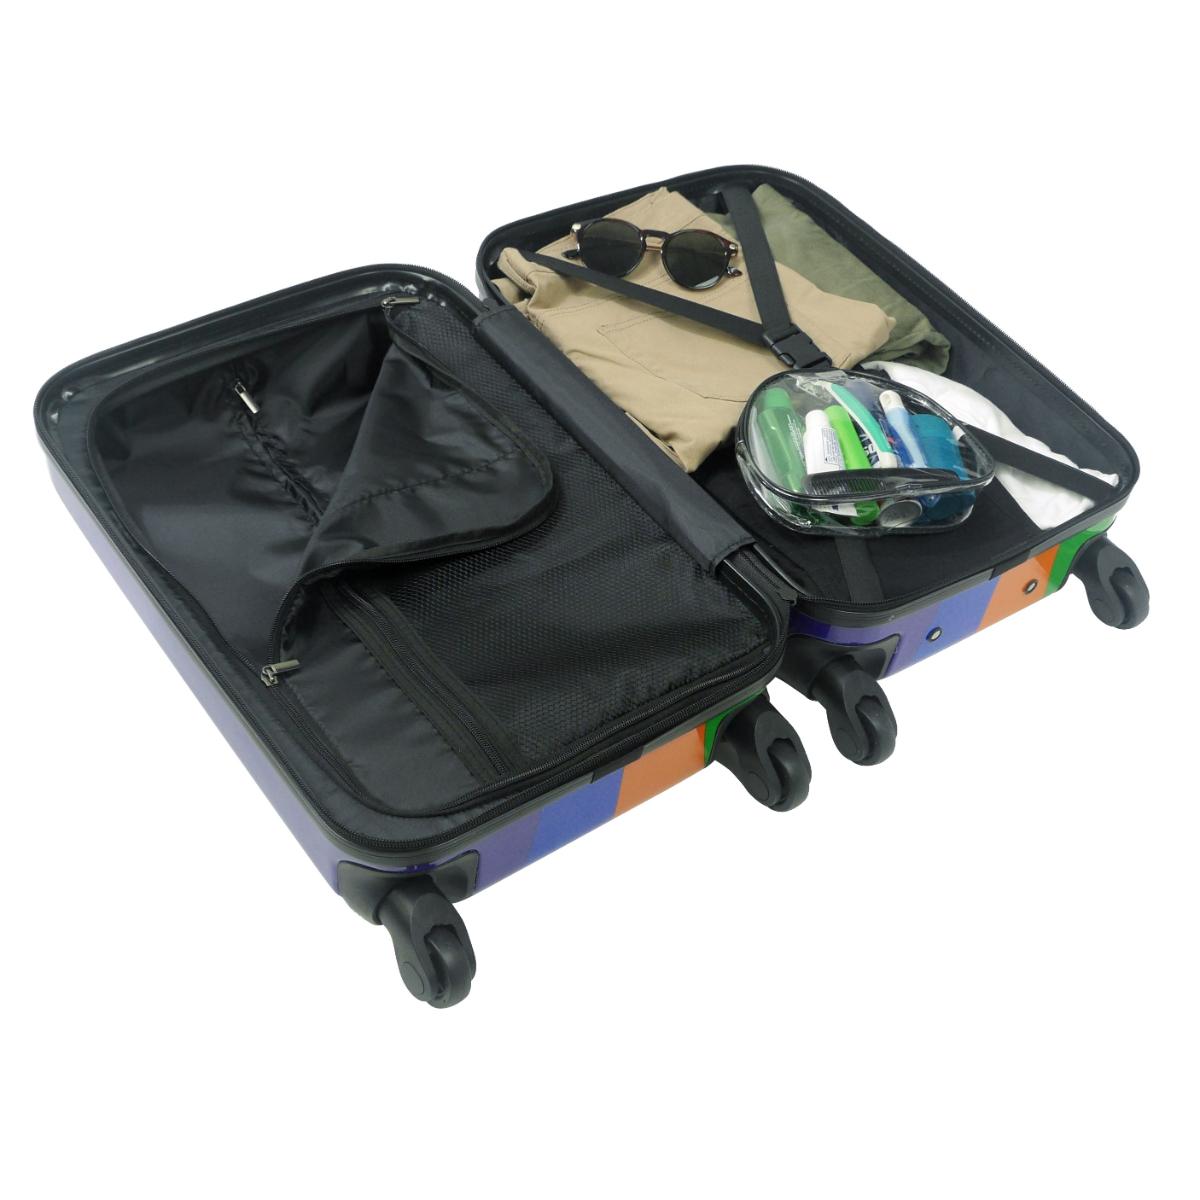 "Striped 21"" Luggage"